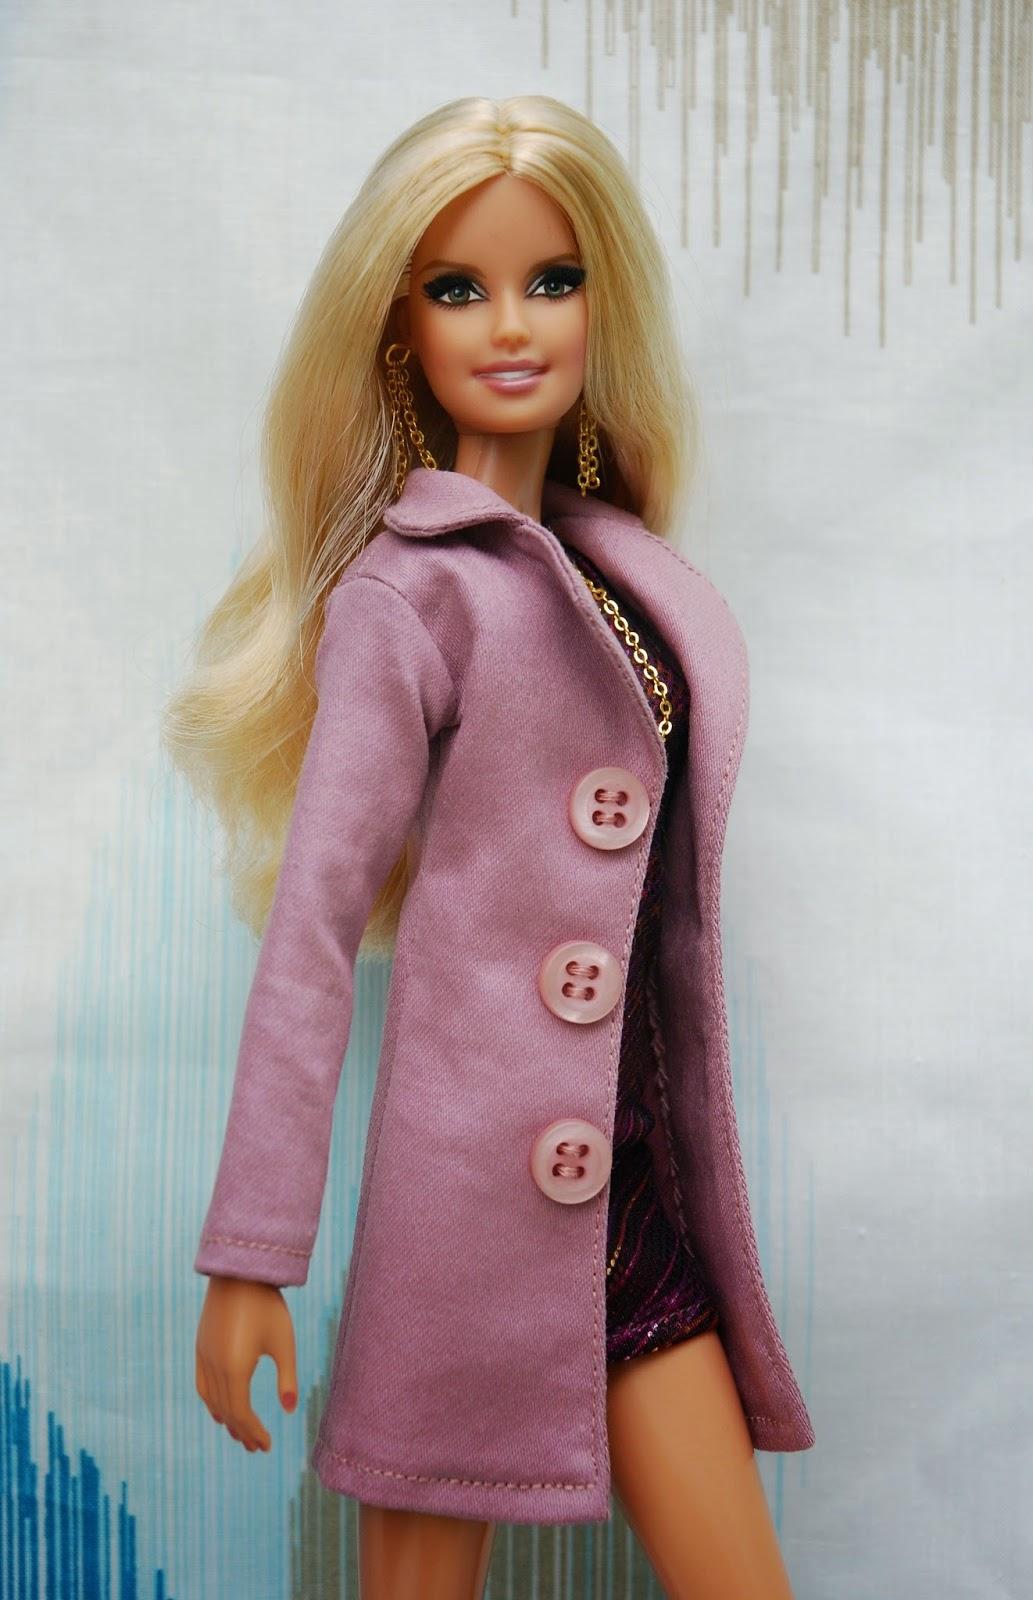 Выкройки кукол барби своими руками фото 712